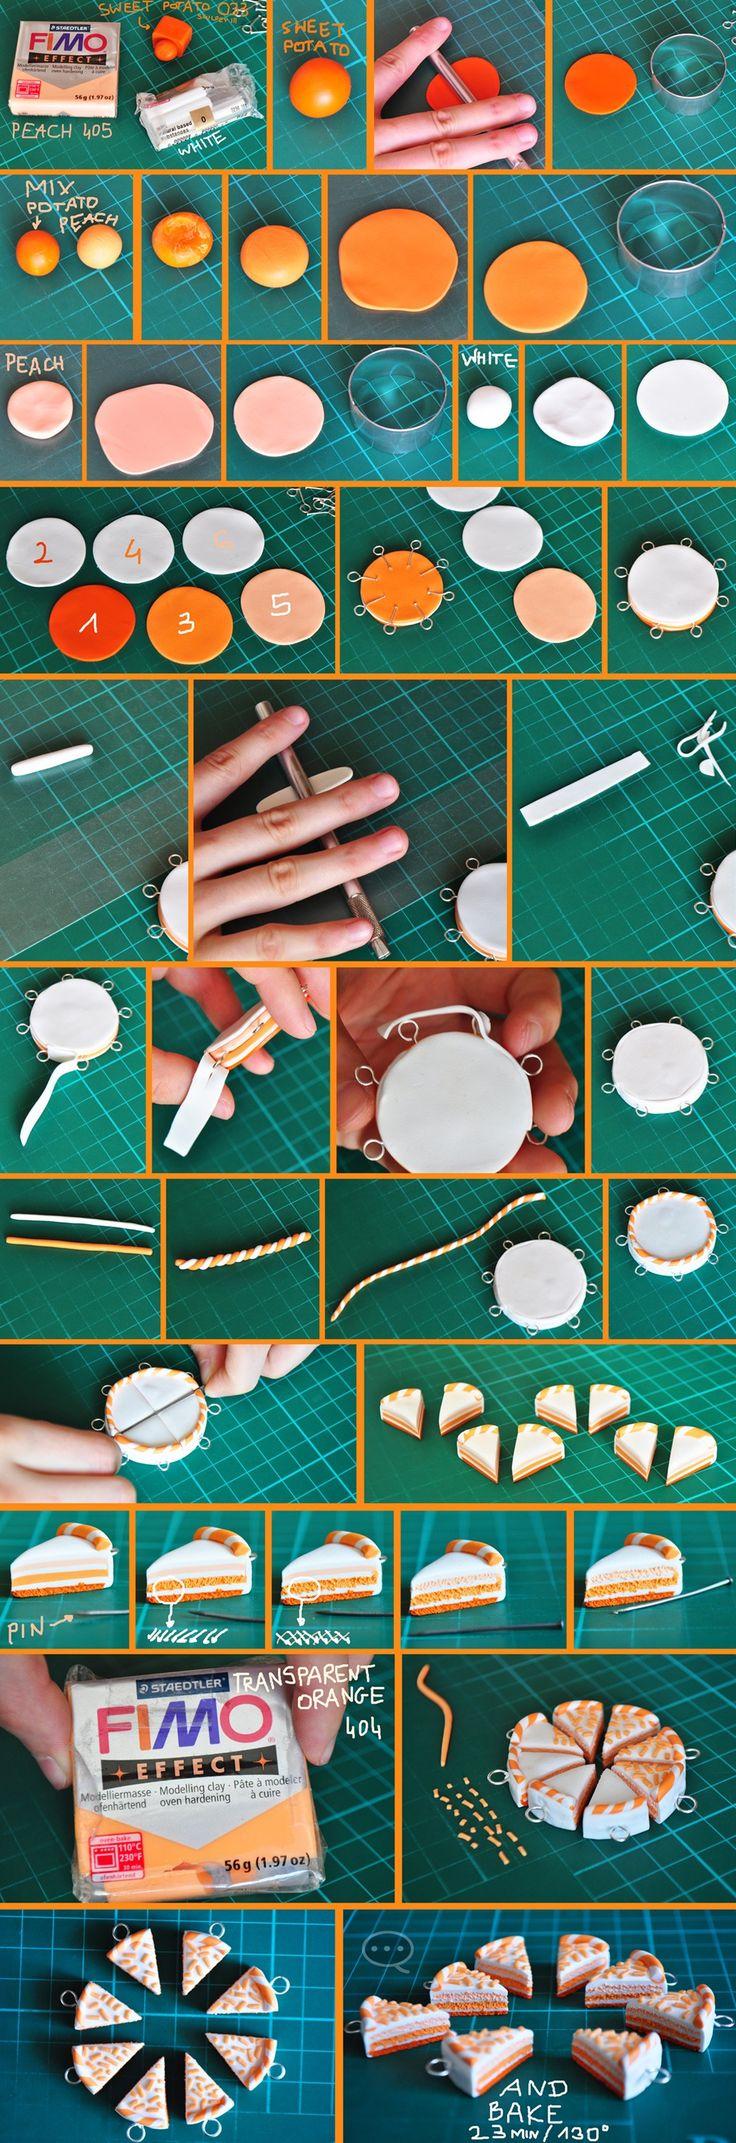 clay orange cake tutorial by cihutka123 on deviantART